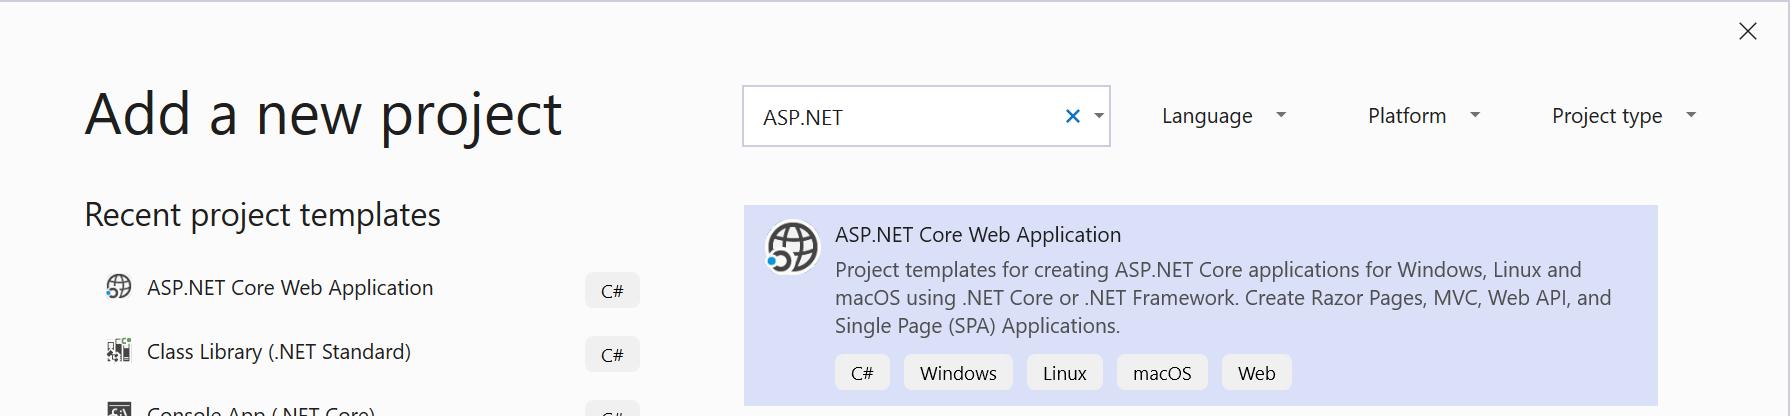 CODE Framework Services in  NET Core - CODE Framework Documentation